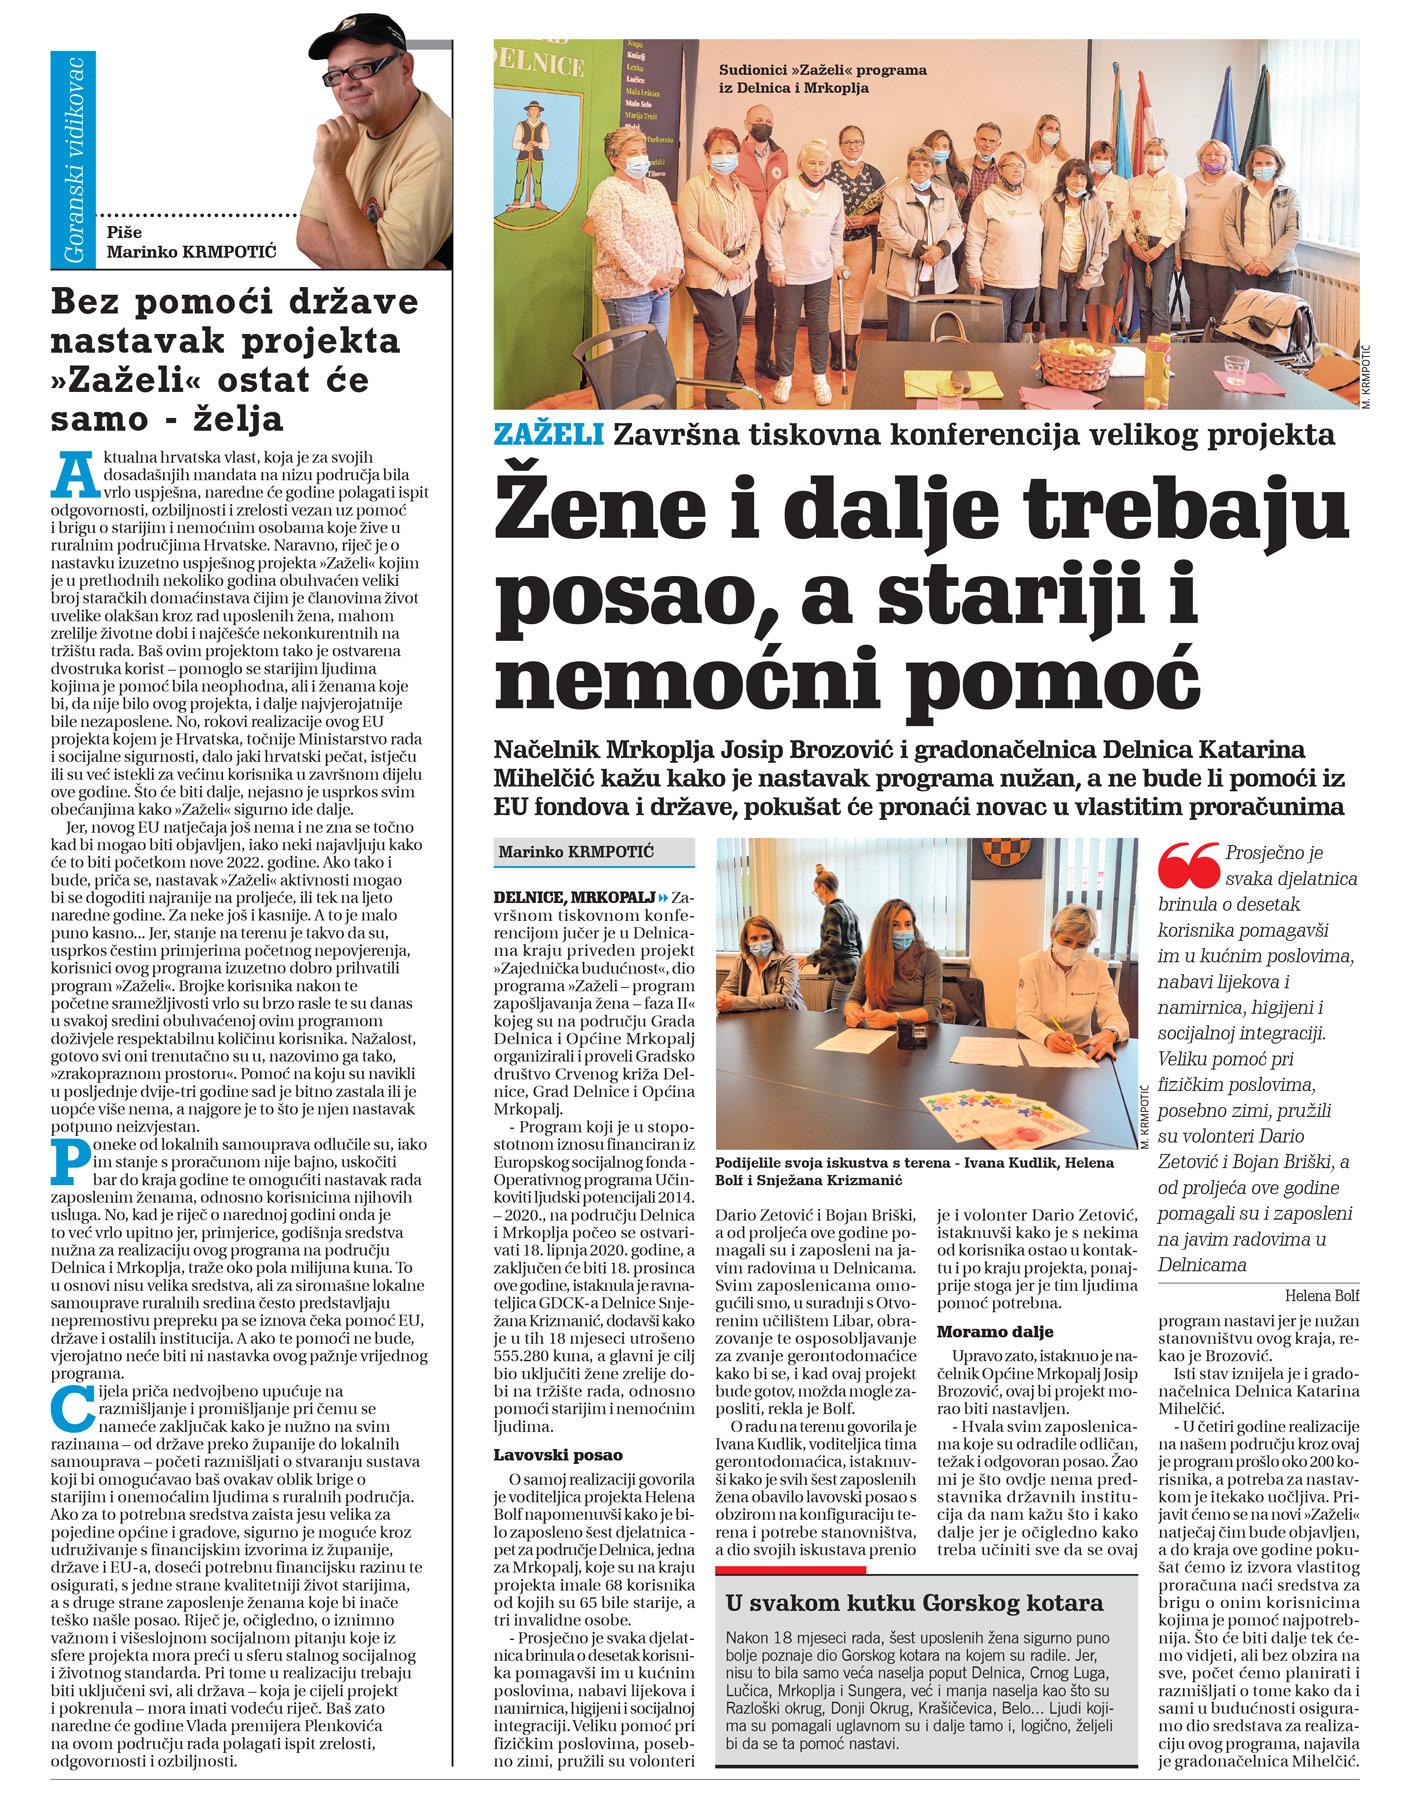 članak, novi list, program zeželi